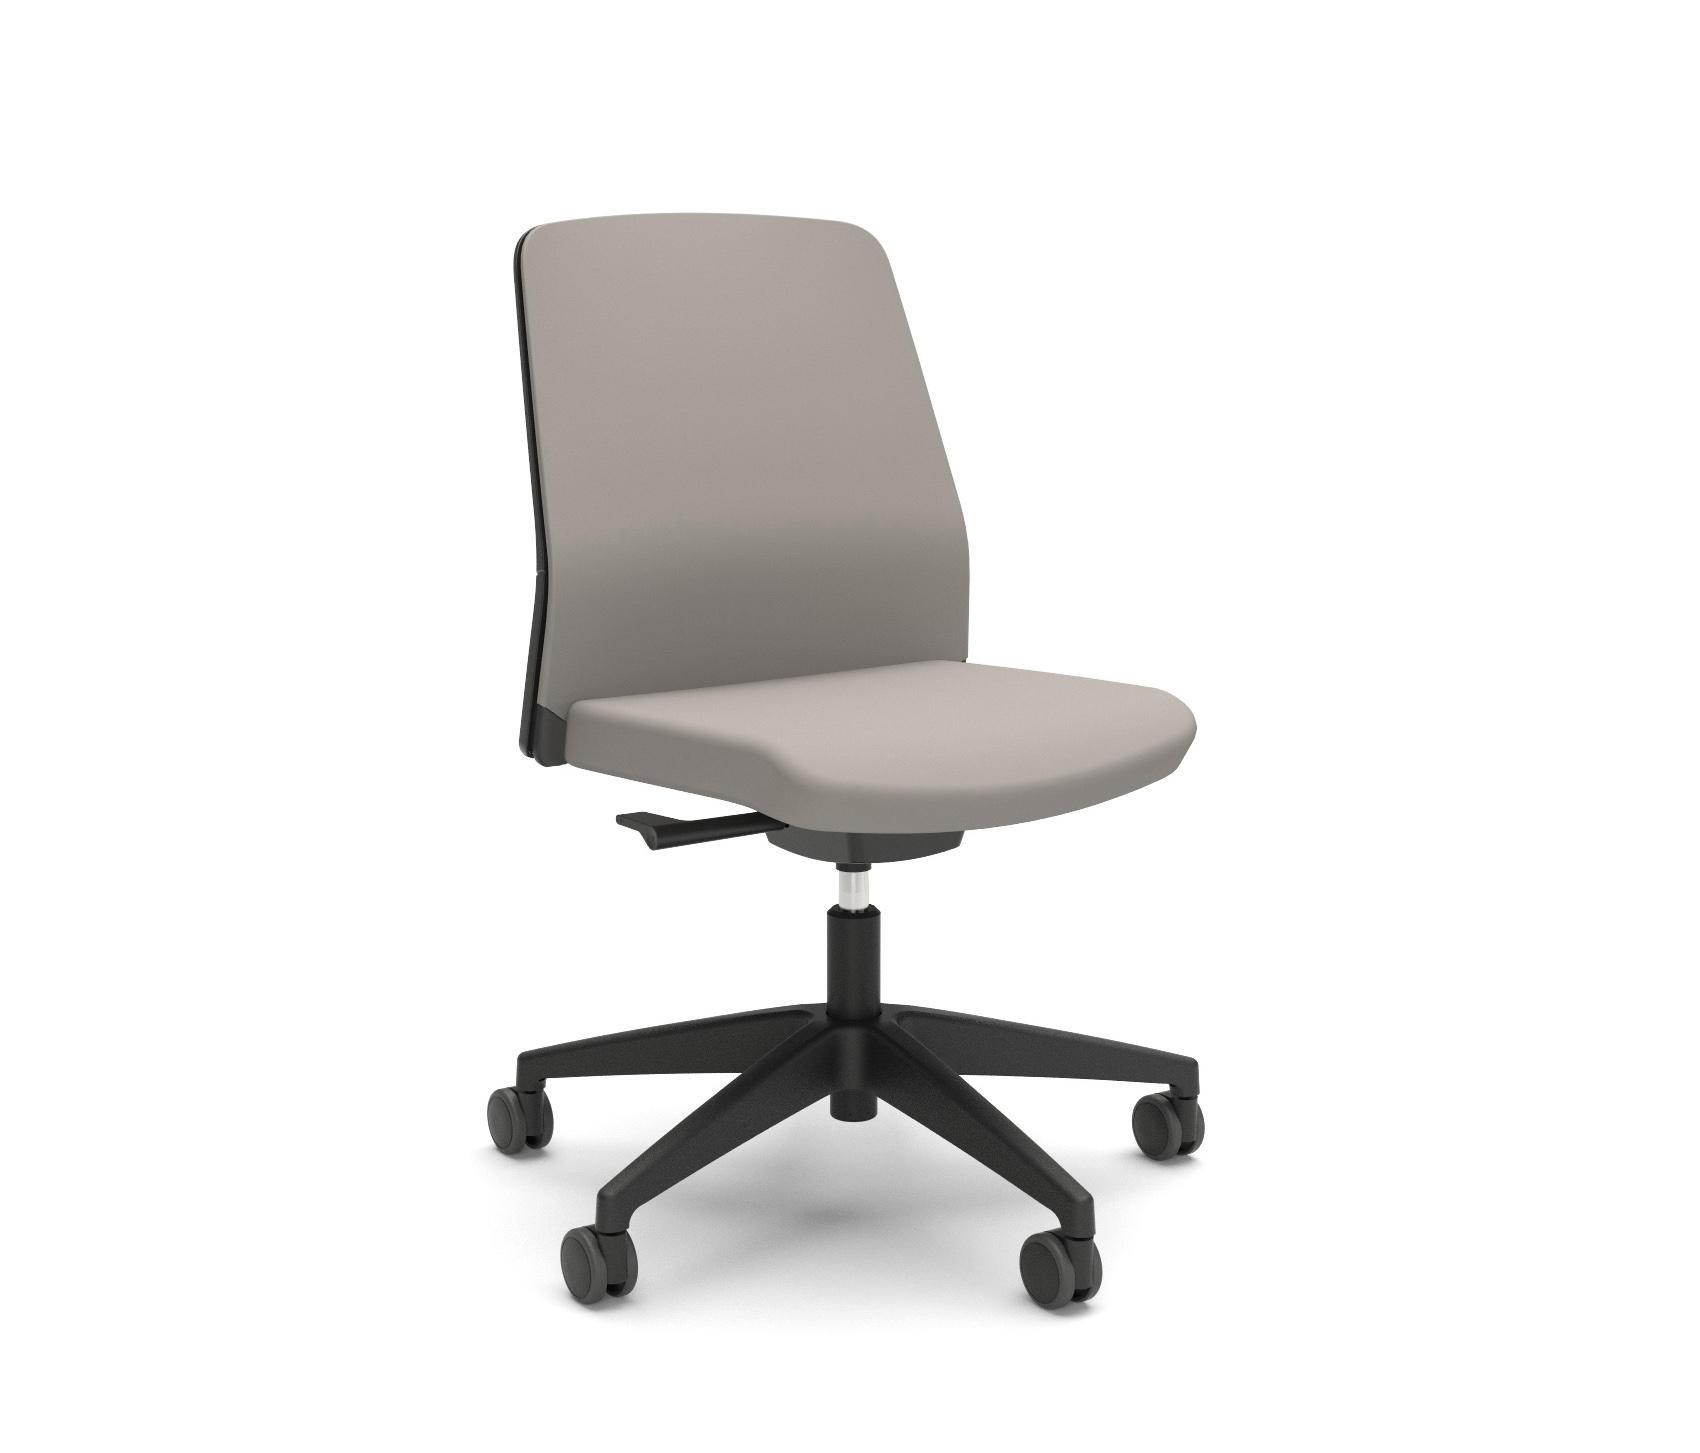 BUDDYIS3 210B - Office chairs from Interstuhl Büromöbel GmbH & Co ...